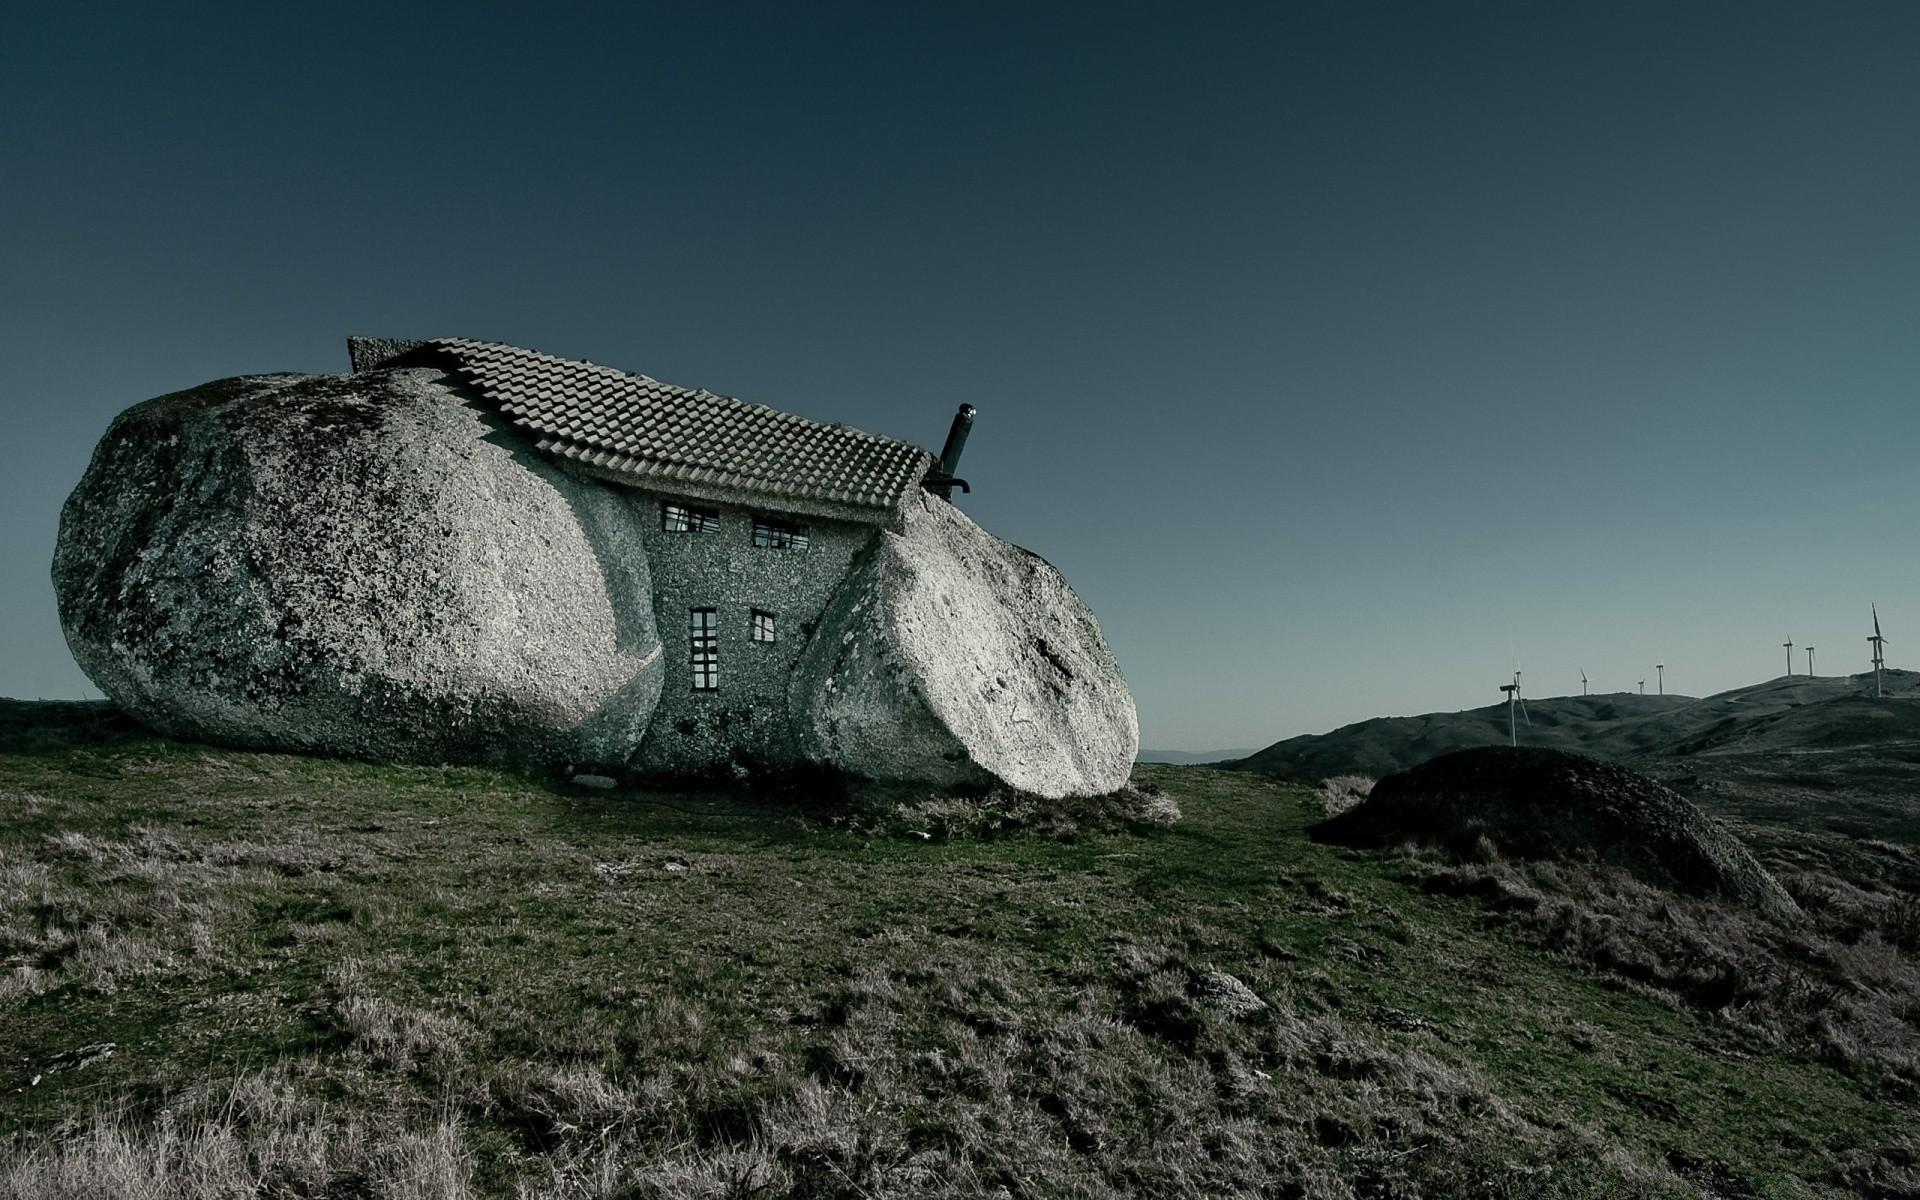 Stone house дом в португалии